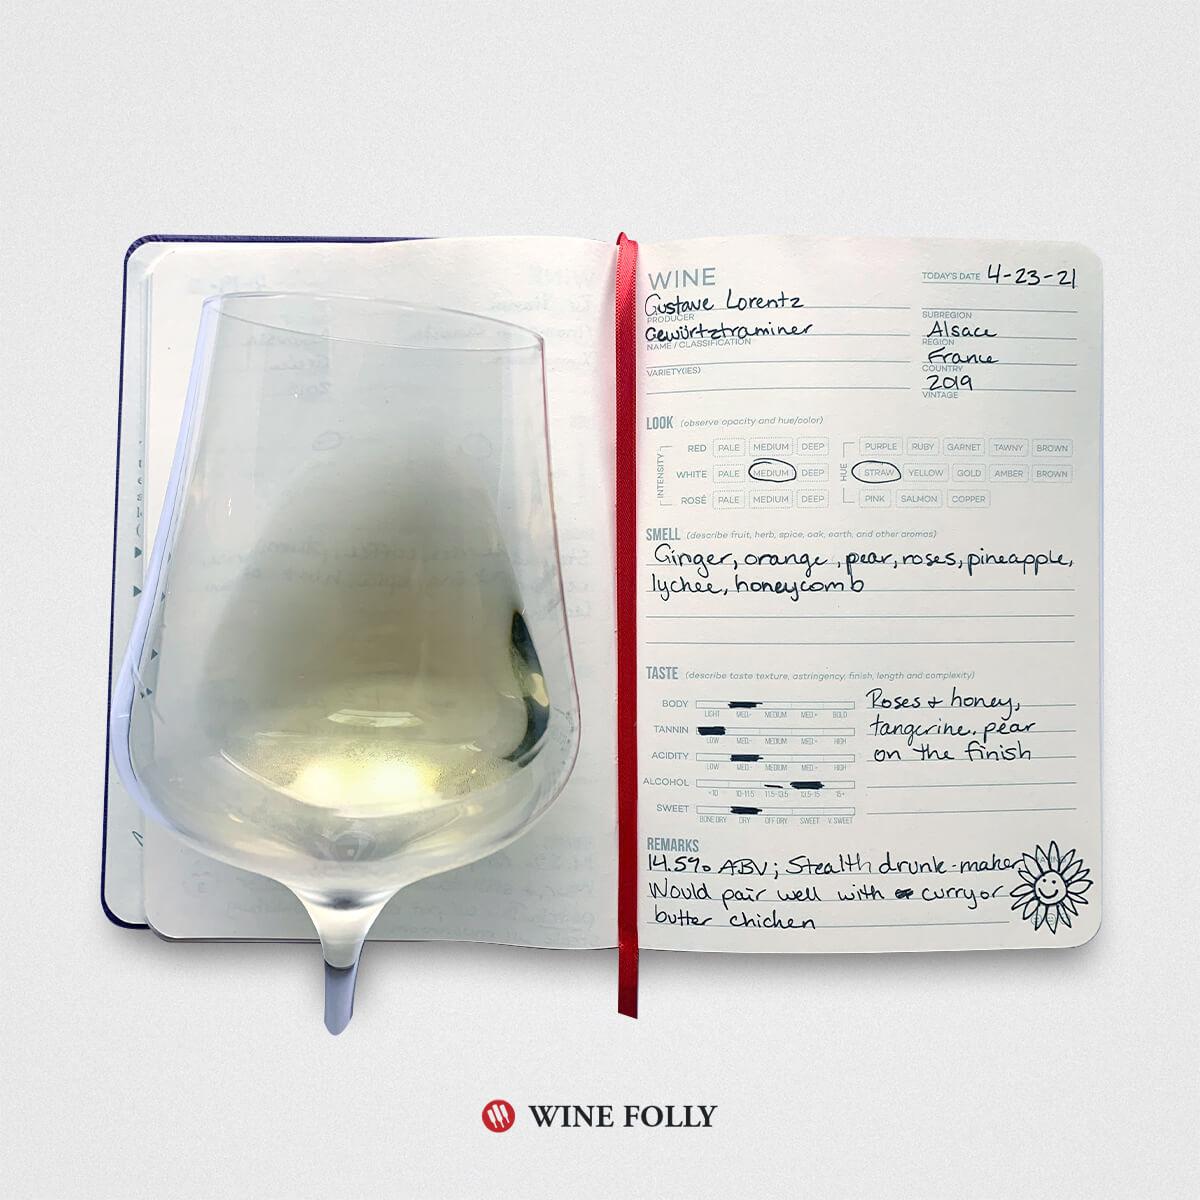 Wine Journal entry with glass of Gewürztraminer wine